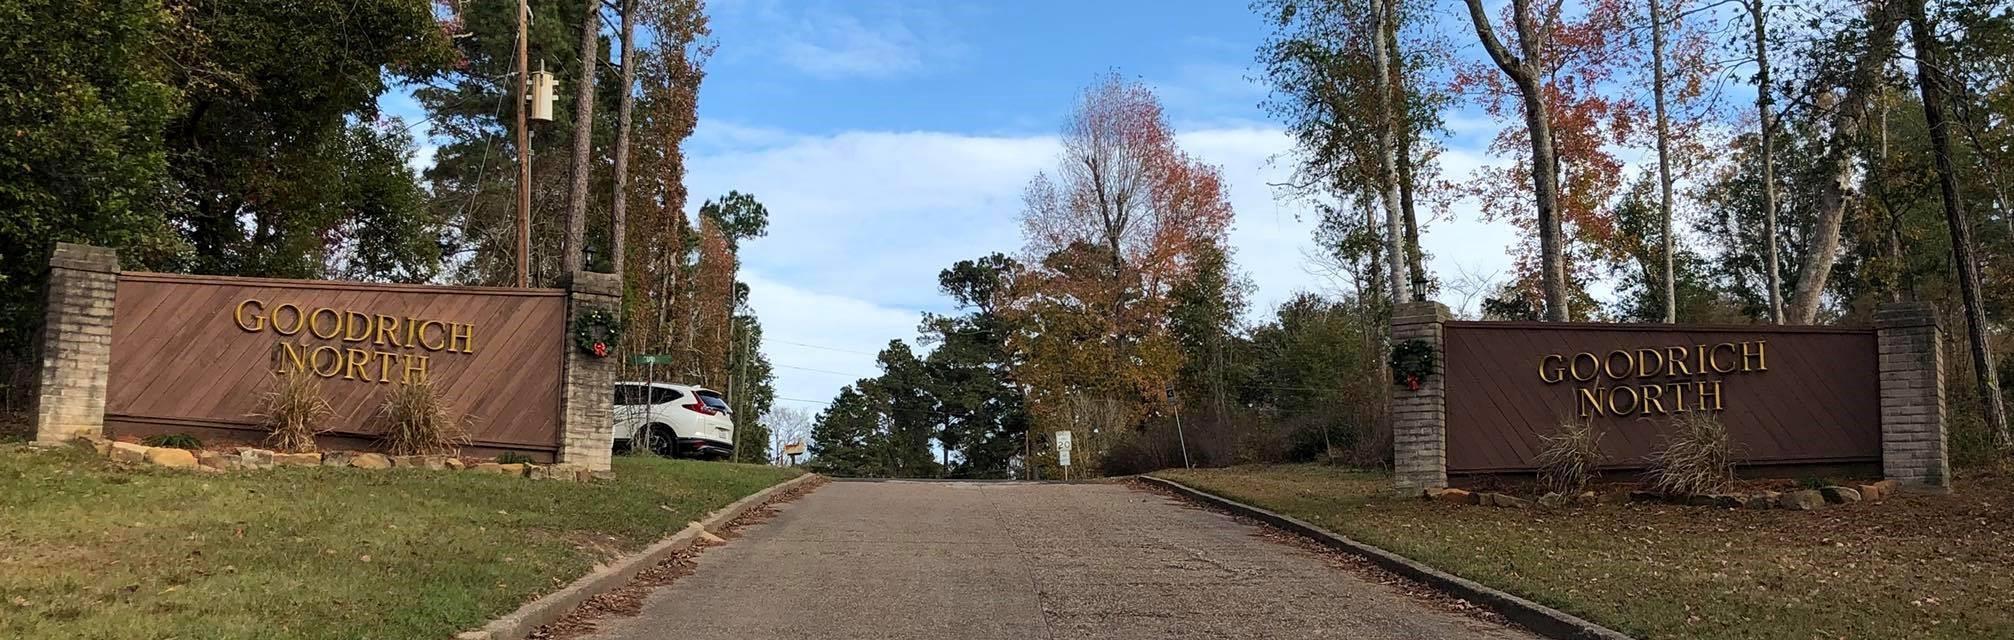 0 Creekridge Drive Property Photo - Goodrich, TX real estate listing